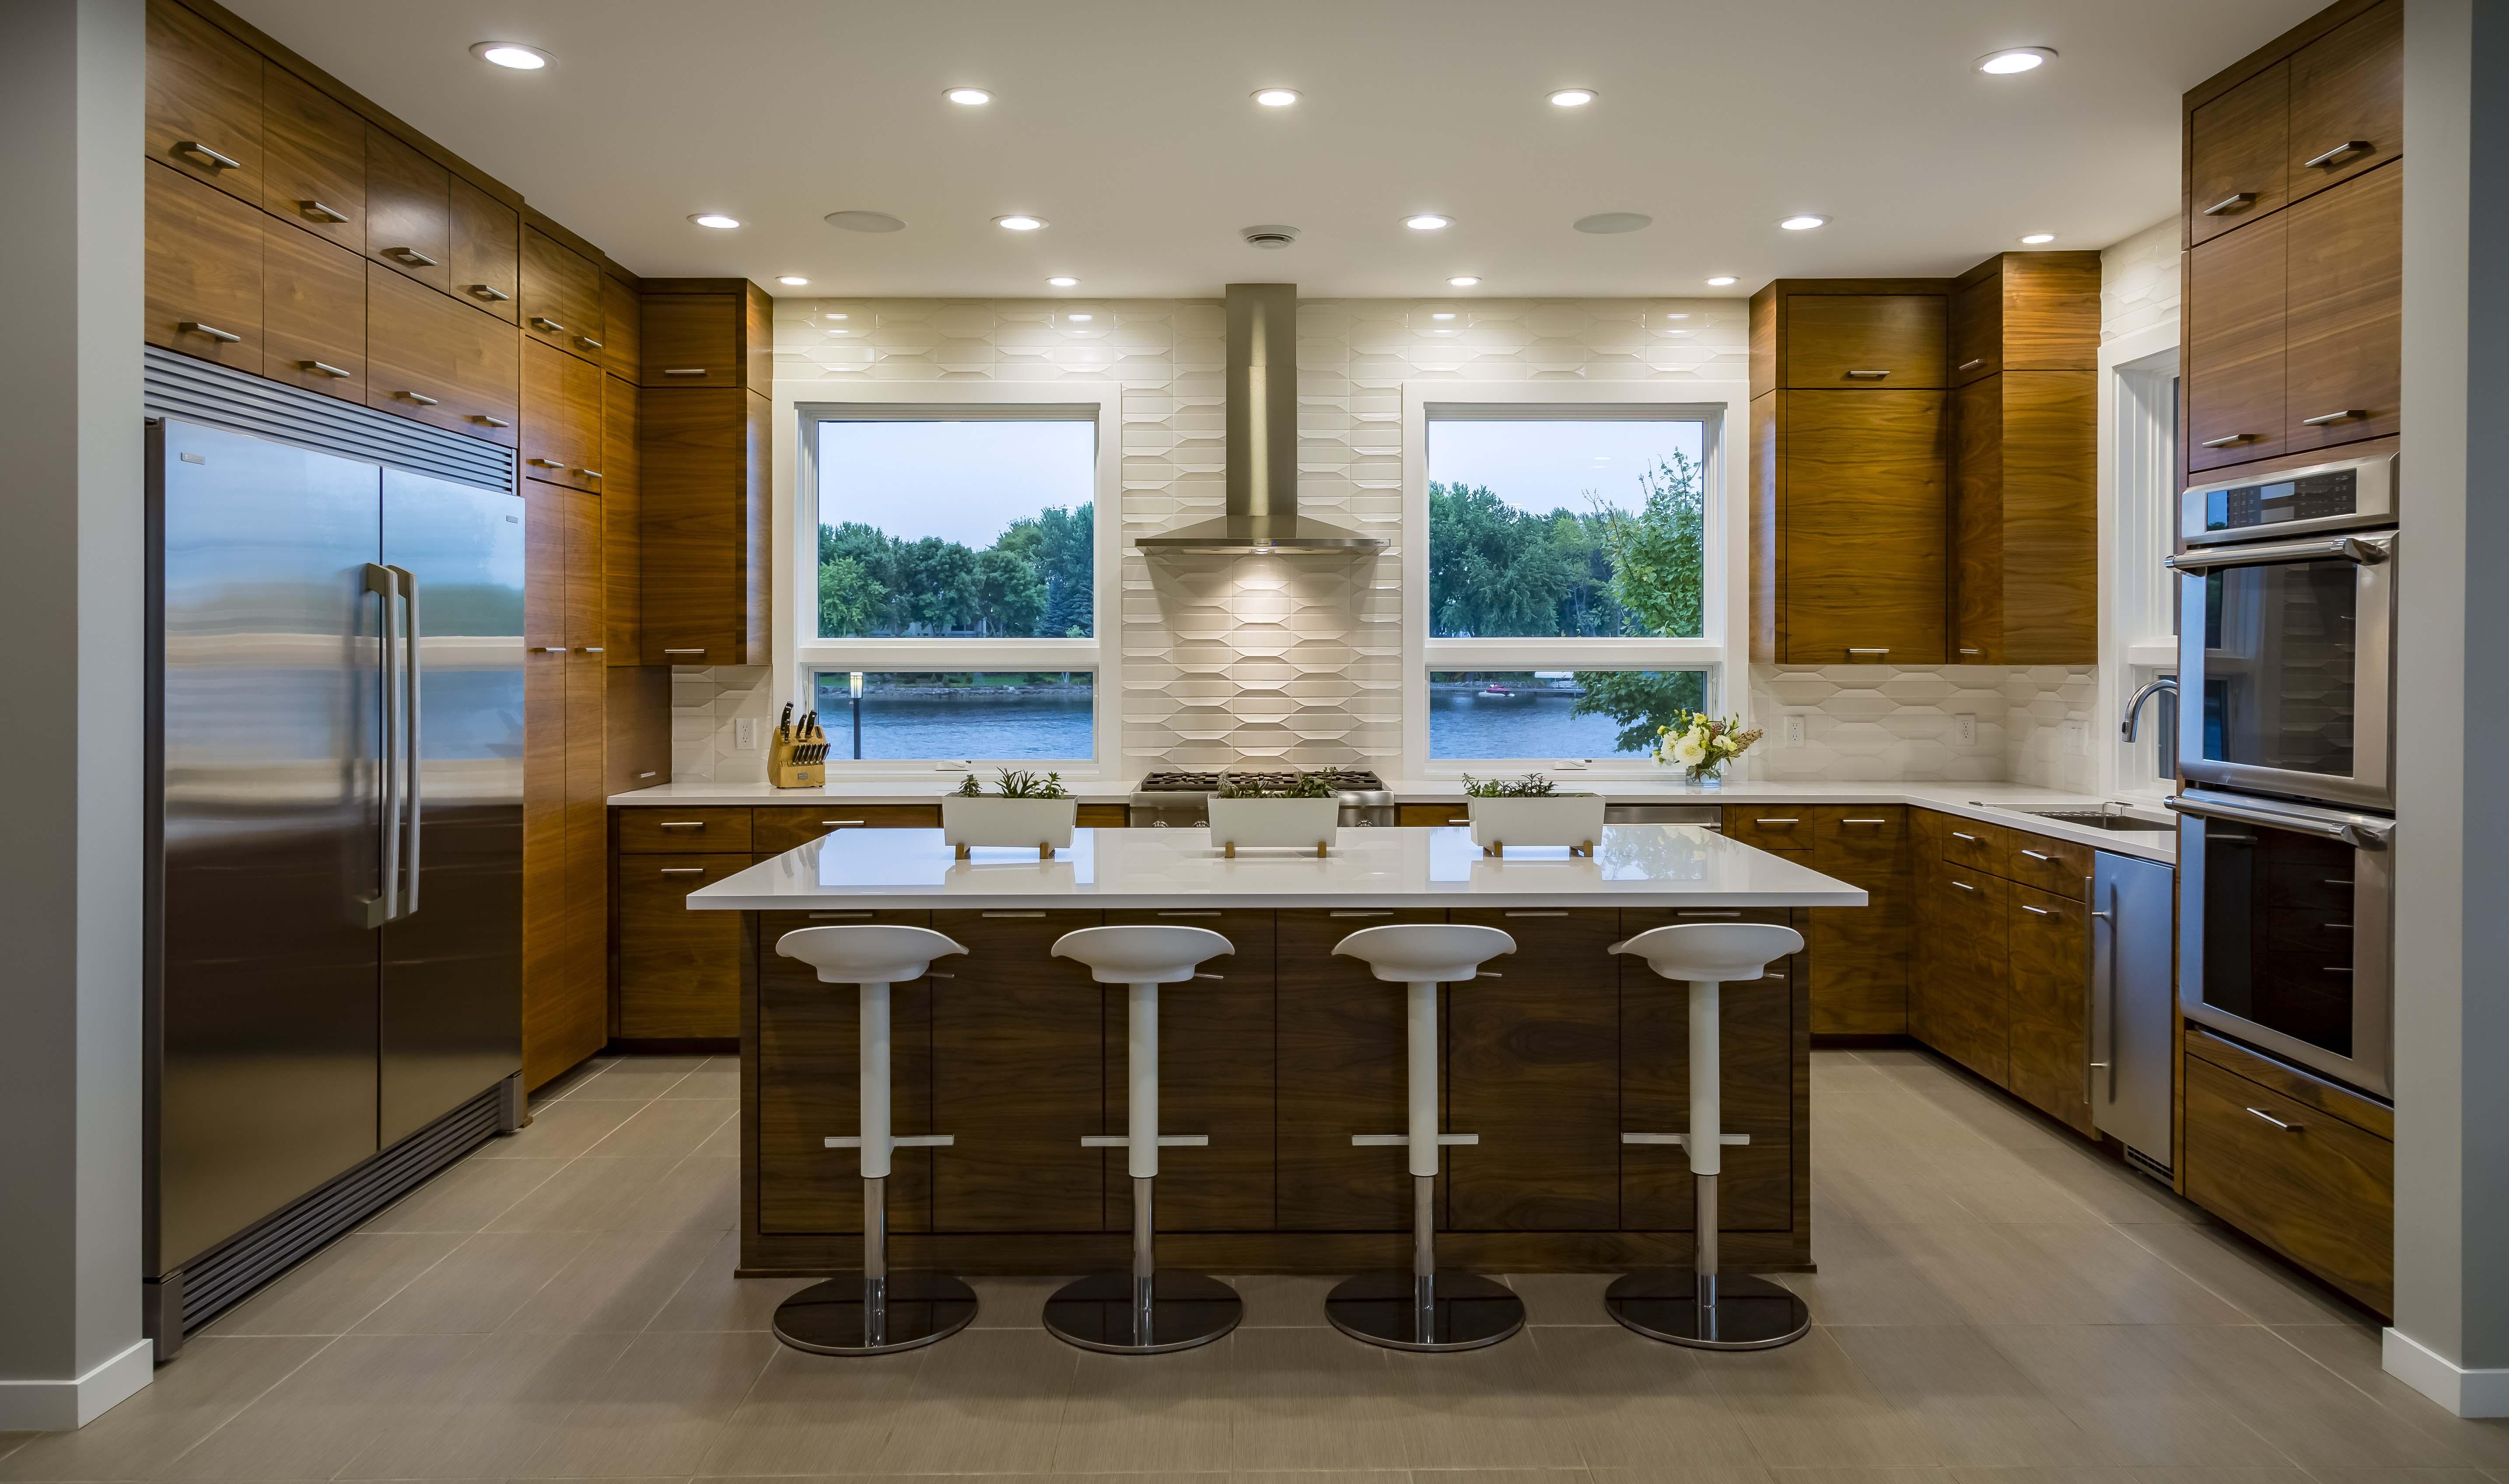 Kitchen Prior Lake Modern